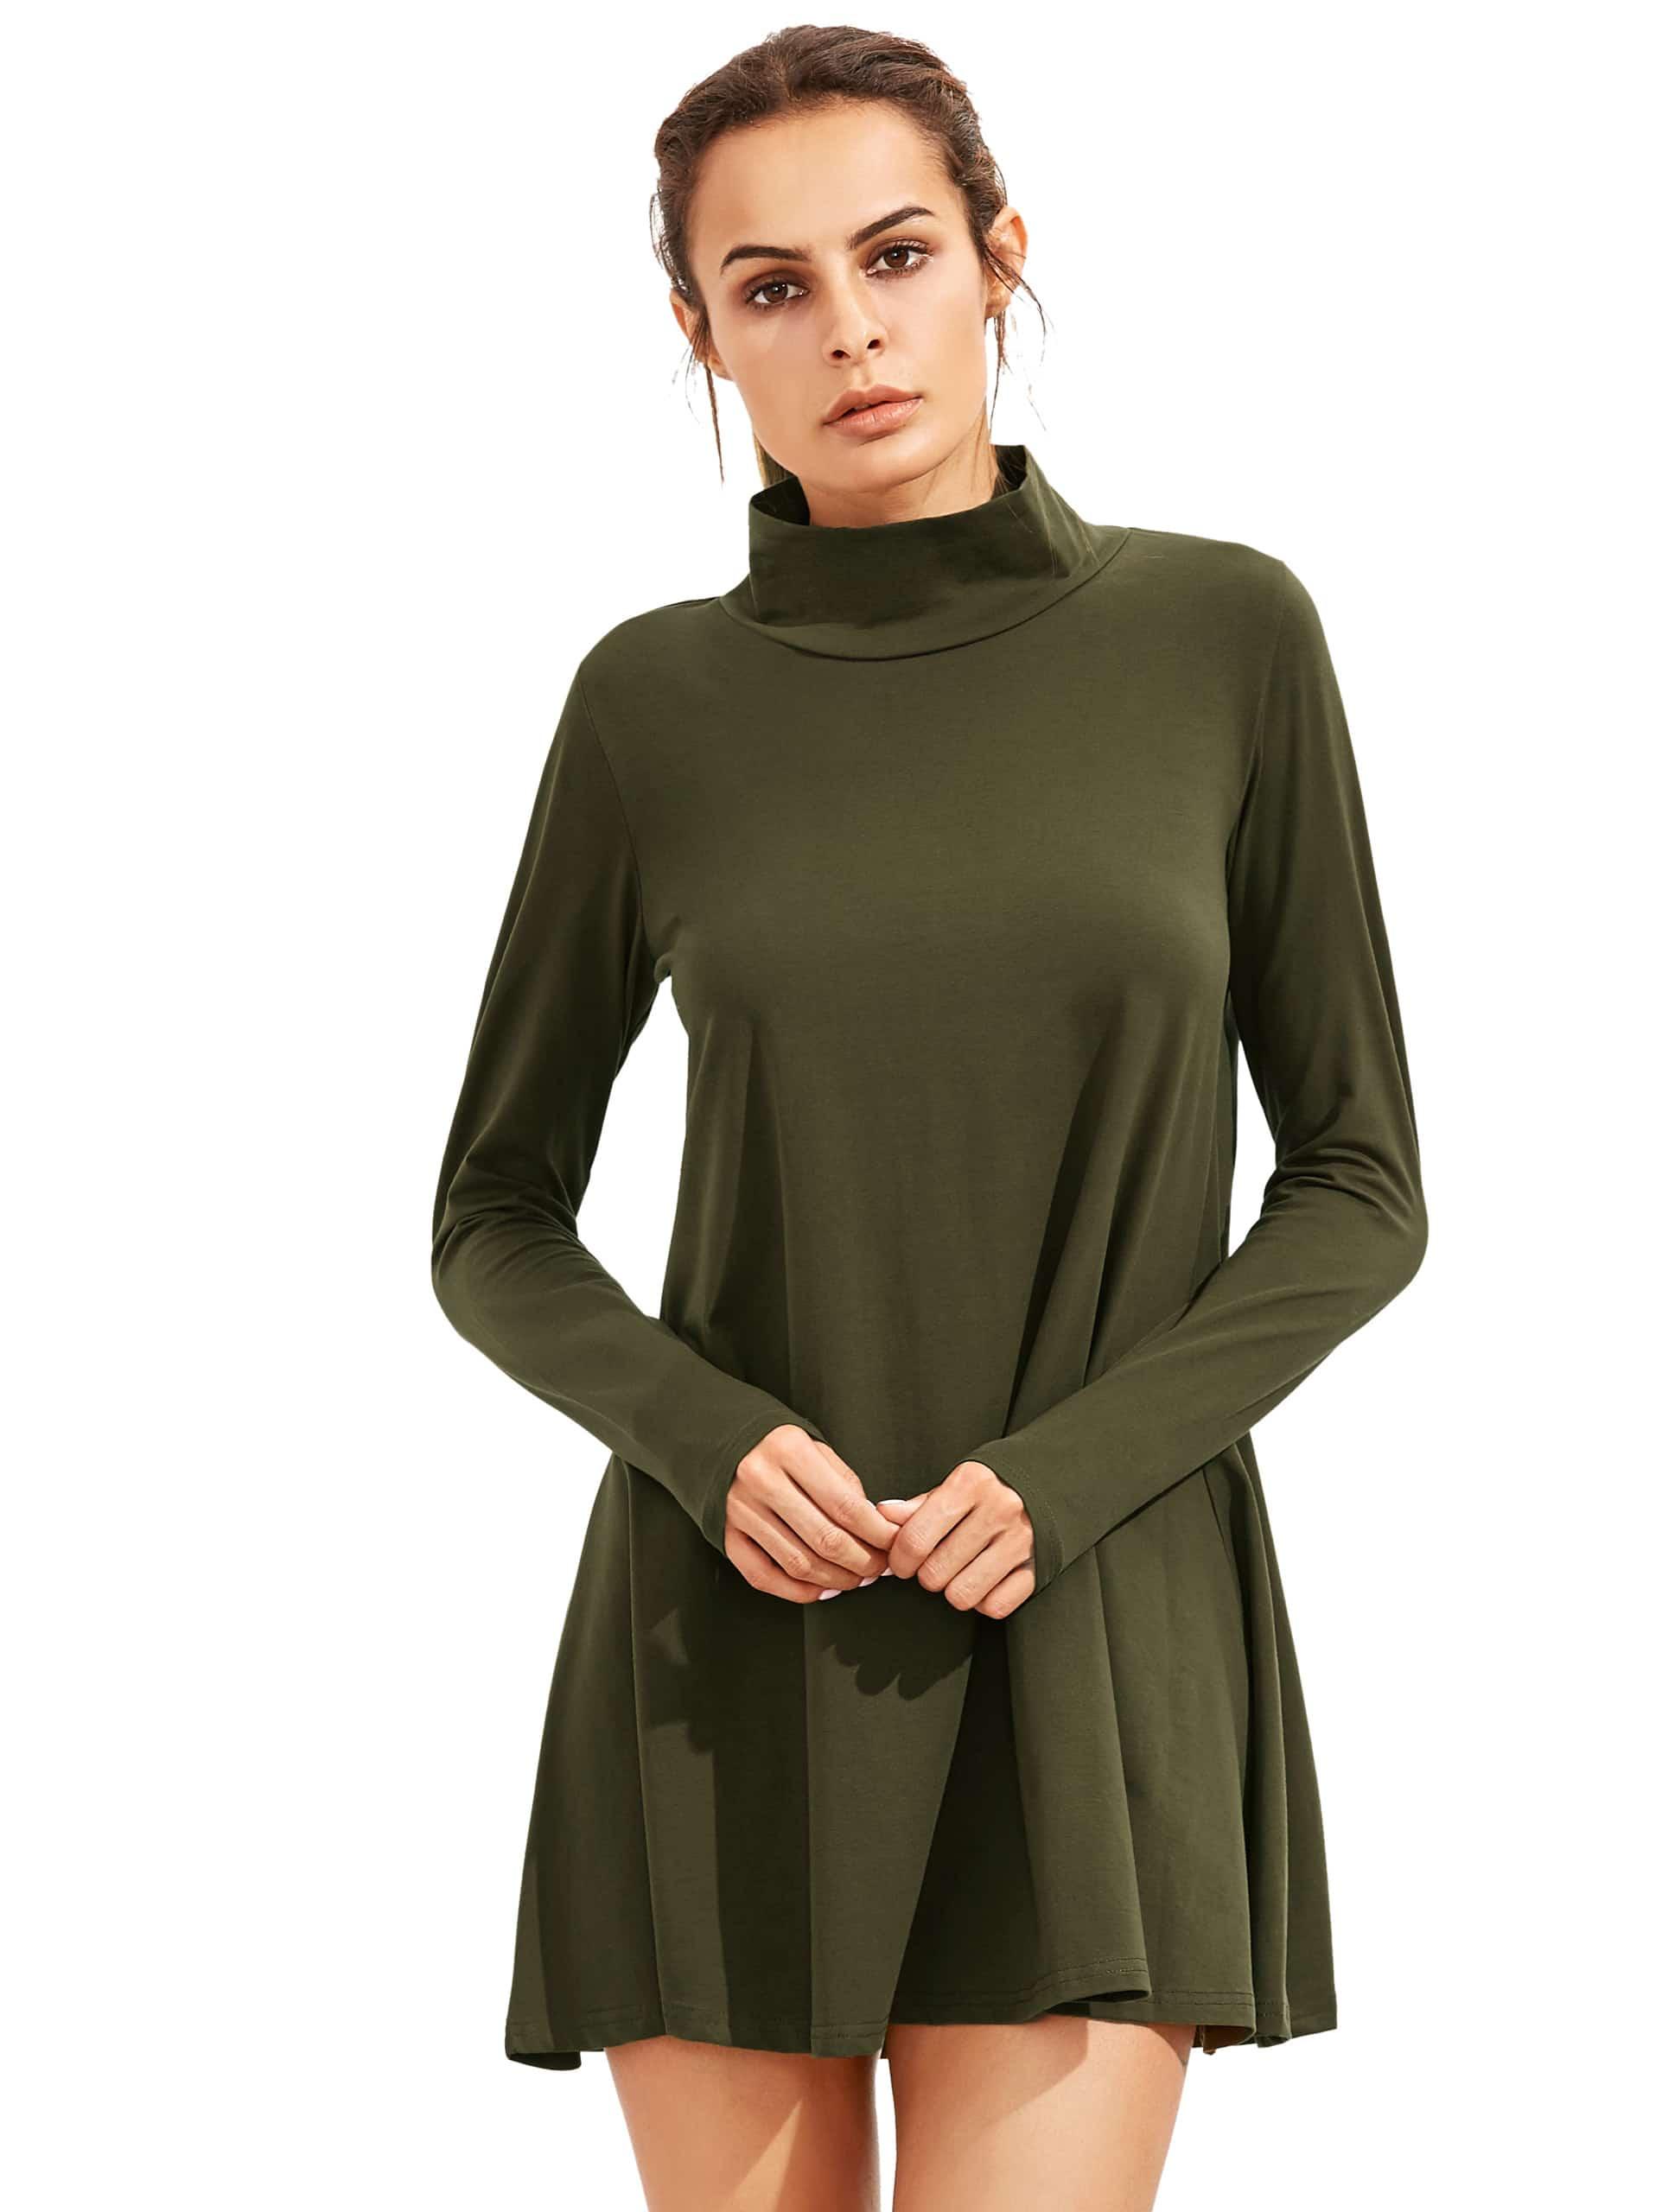 Фото Army Green Pullover Long Sleeve Casual Dress. Купить с доставкой